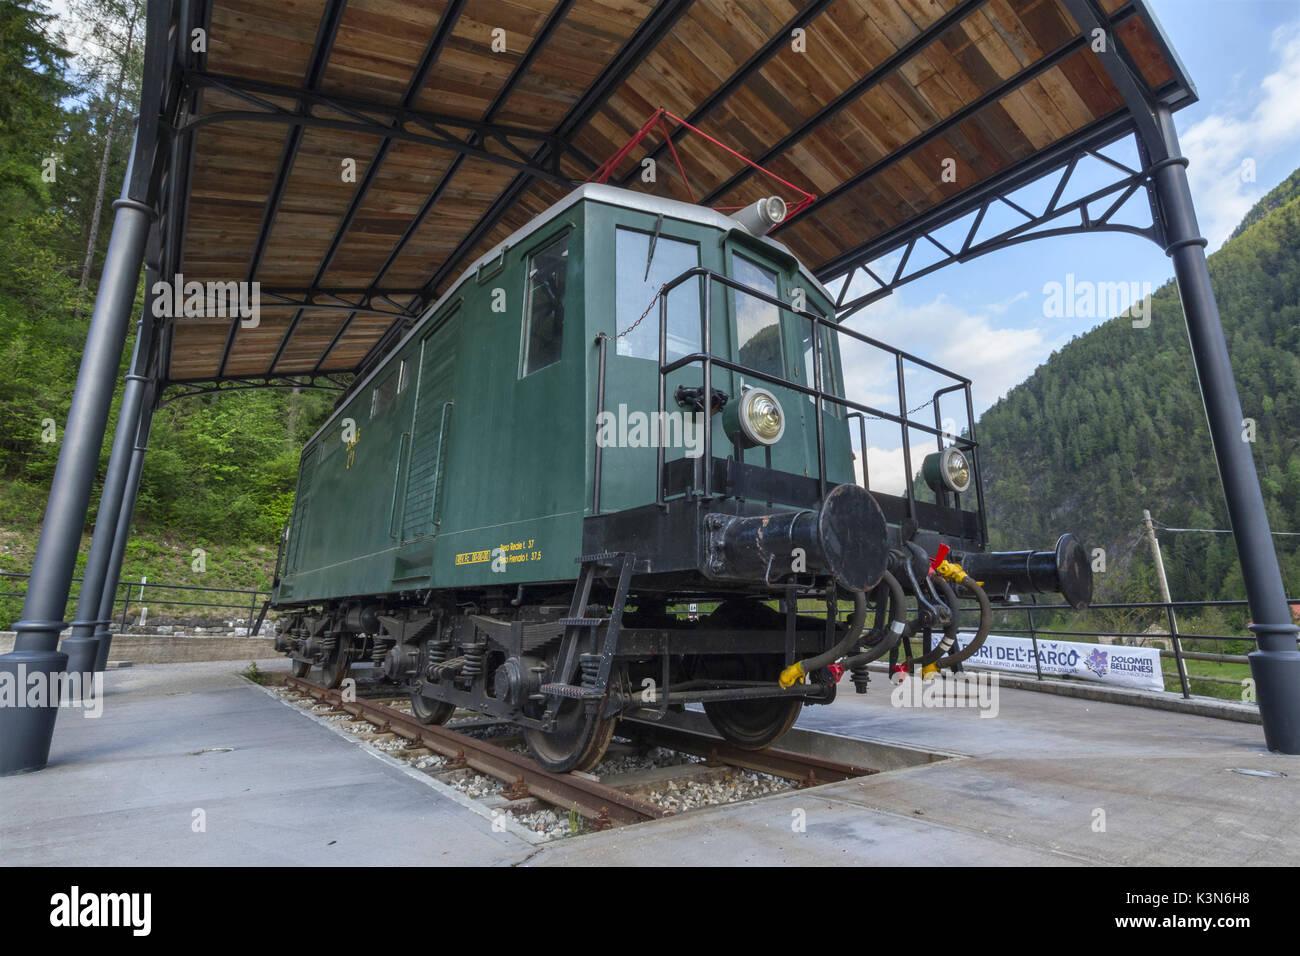 Europe, Italy, Veneto, Agordino. The old locomotive LB1 SAIF of the line  Bribano - Agordo exposed in the mining area of Valle Imperina Rivamonte Agordino, Dolomites - Stock Image